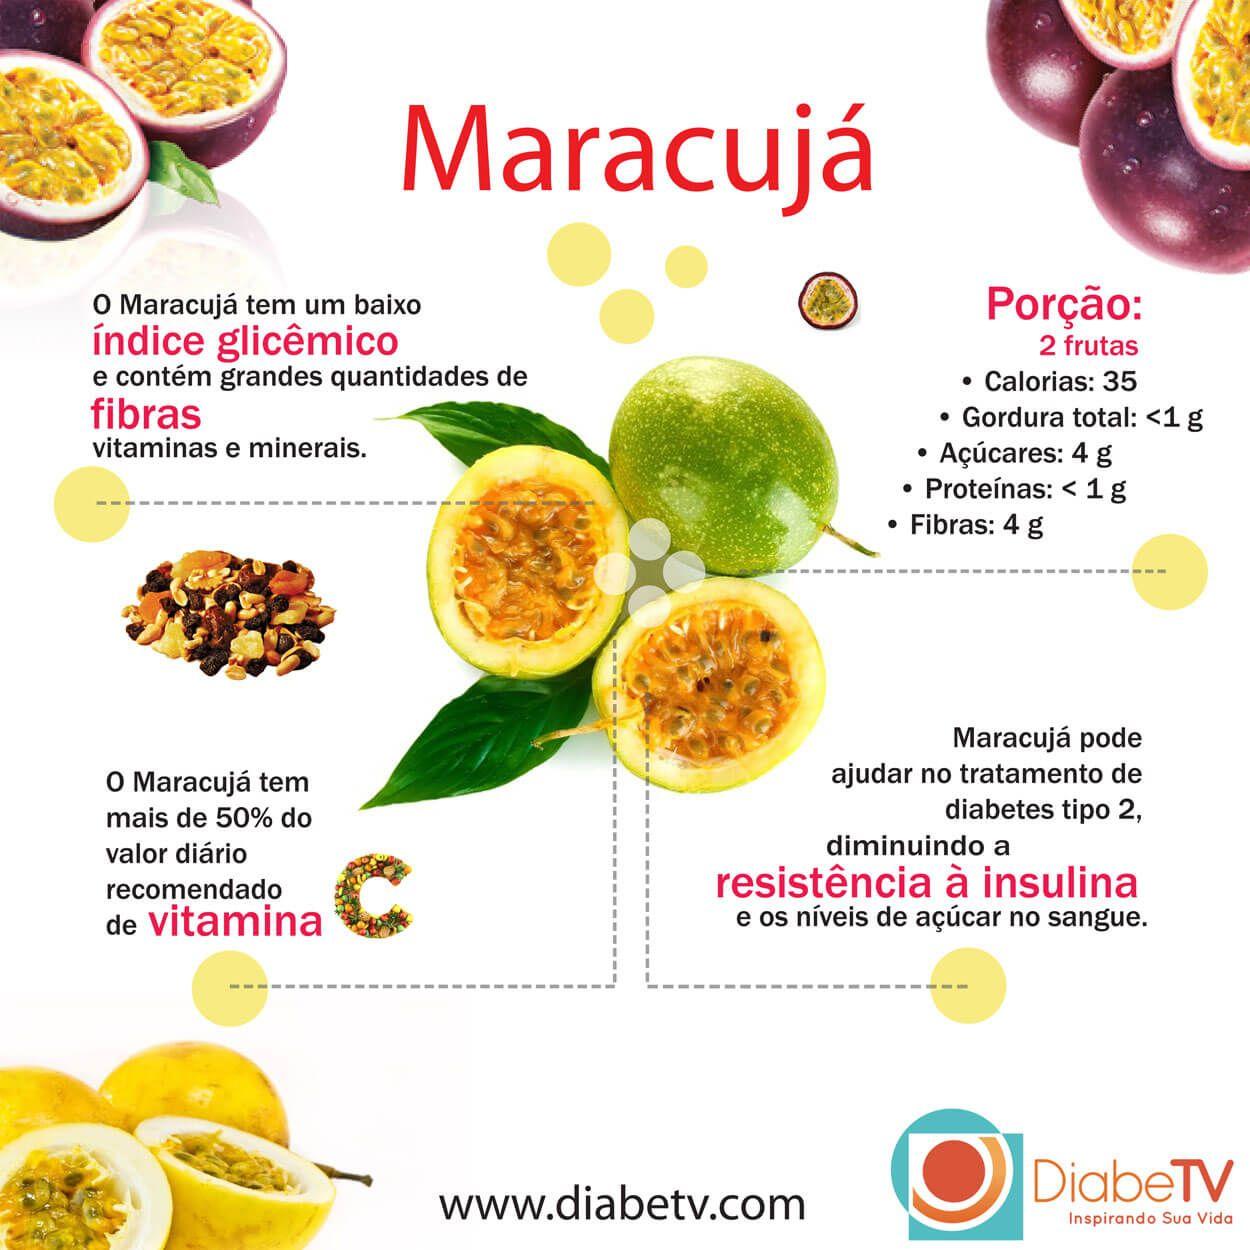 maracuja-frutas-podem-comer-diabeticos | Diabetes